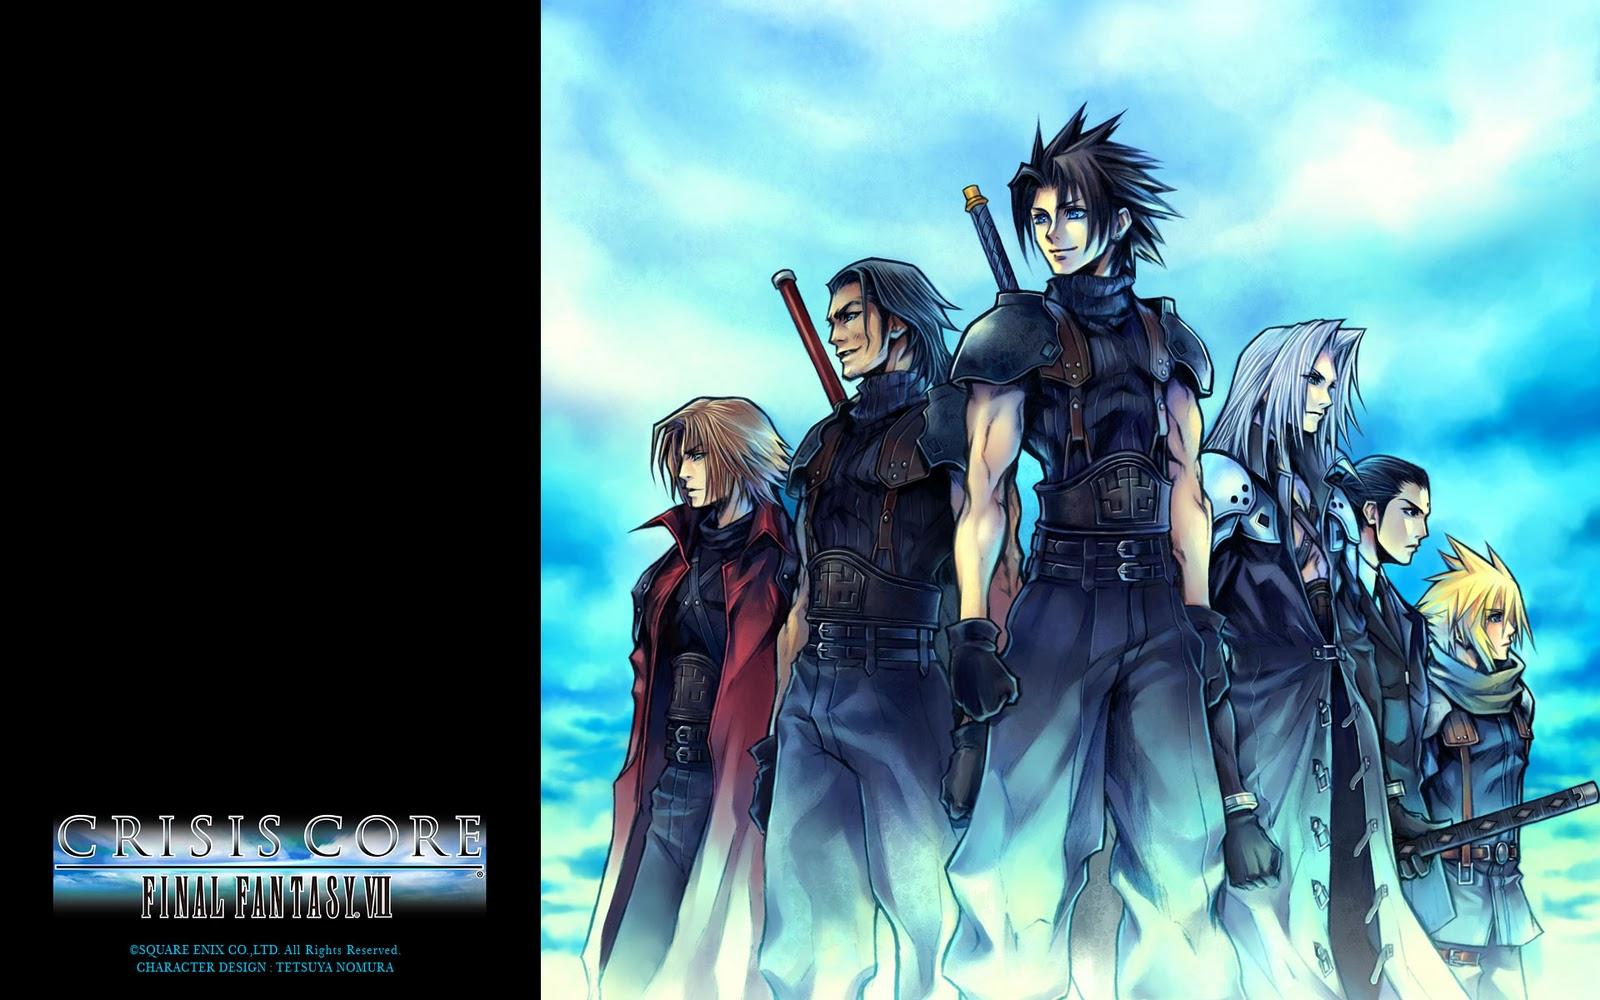 Free PSP Themes Wallpaper: Final Fantasy PSP wallpaper ...